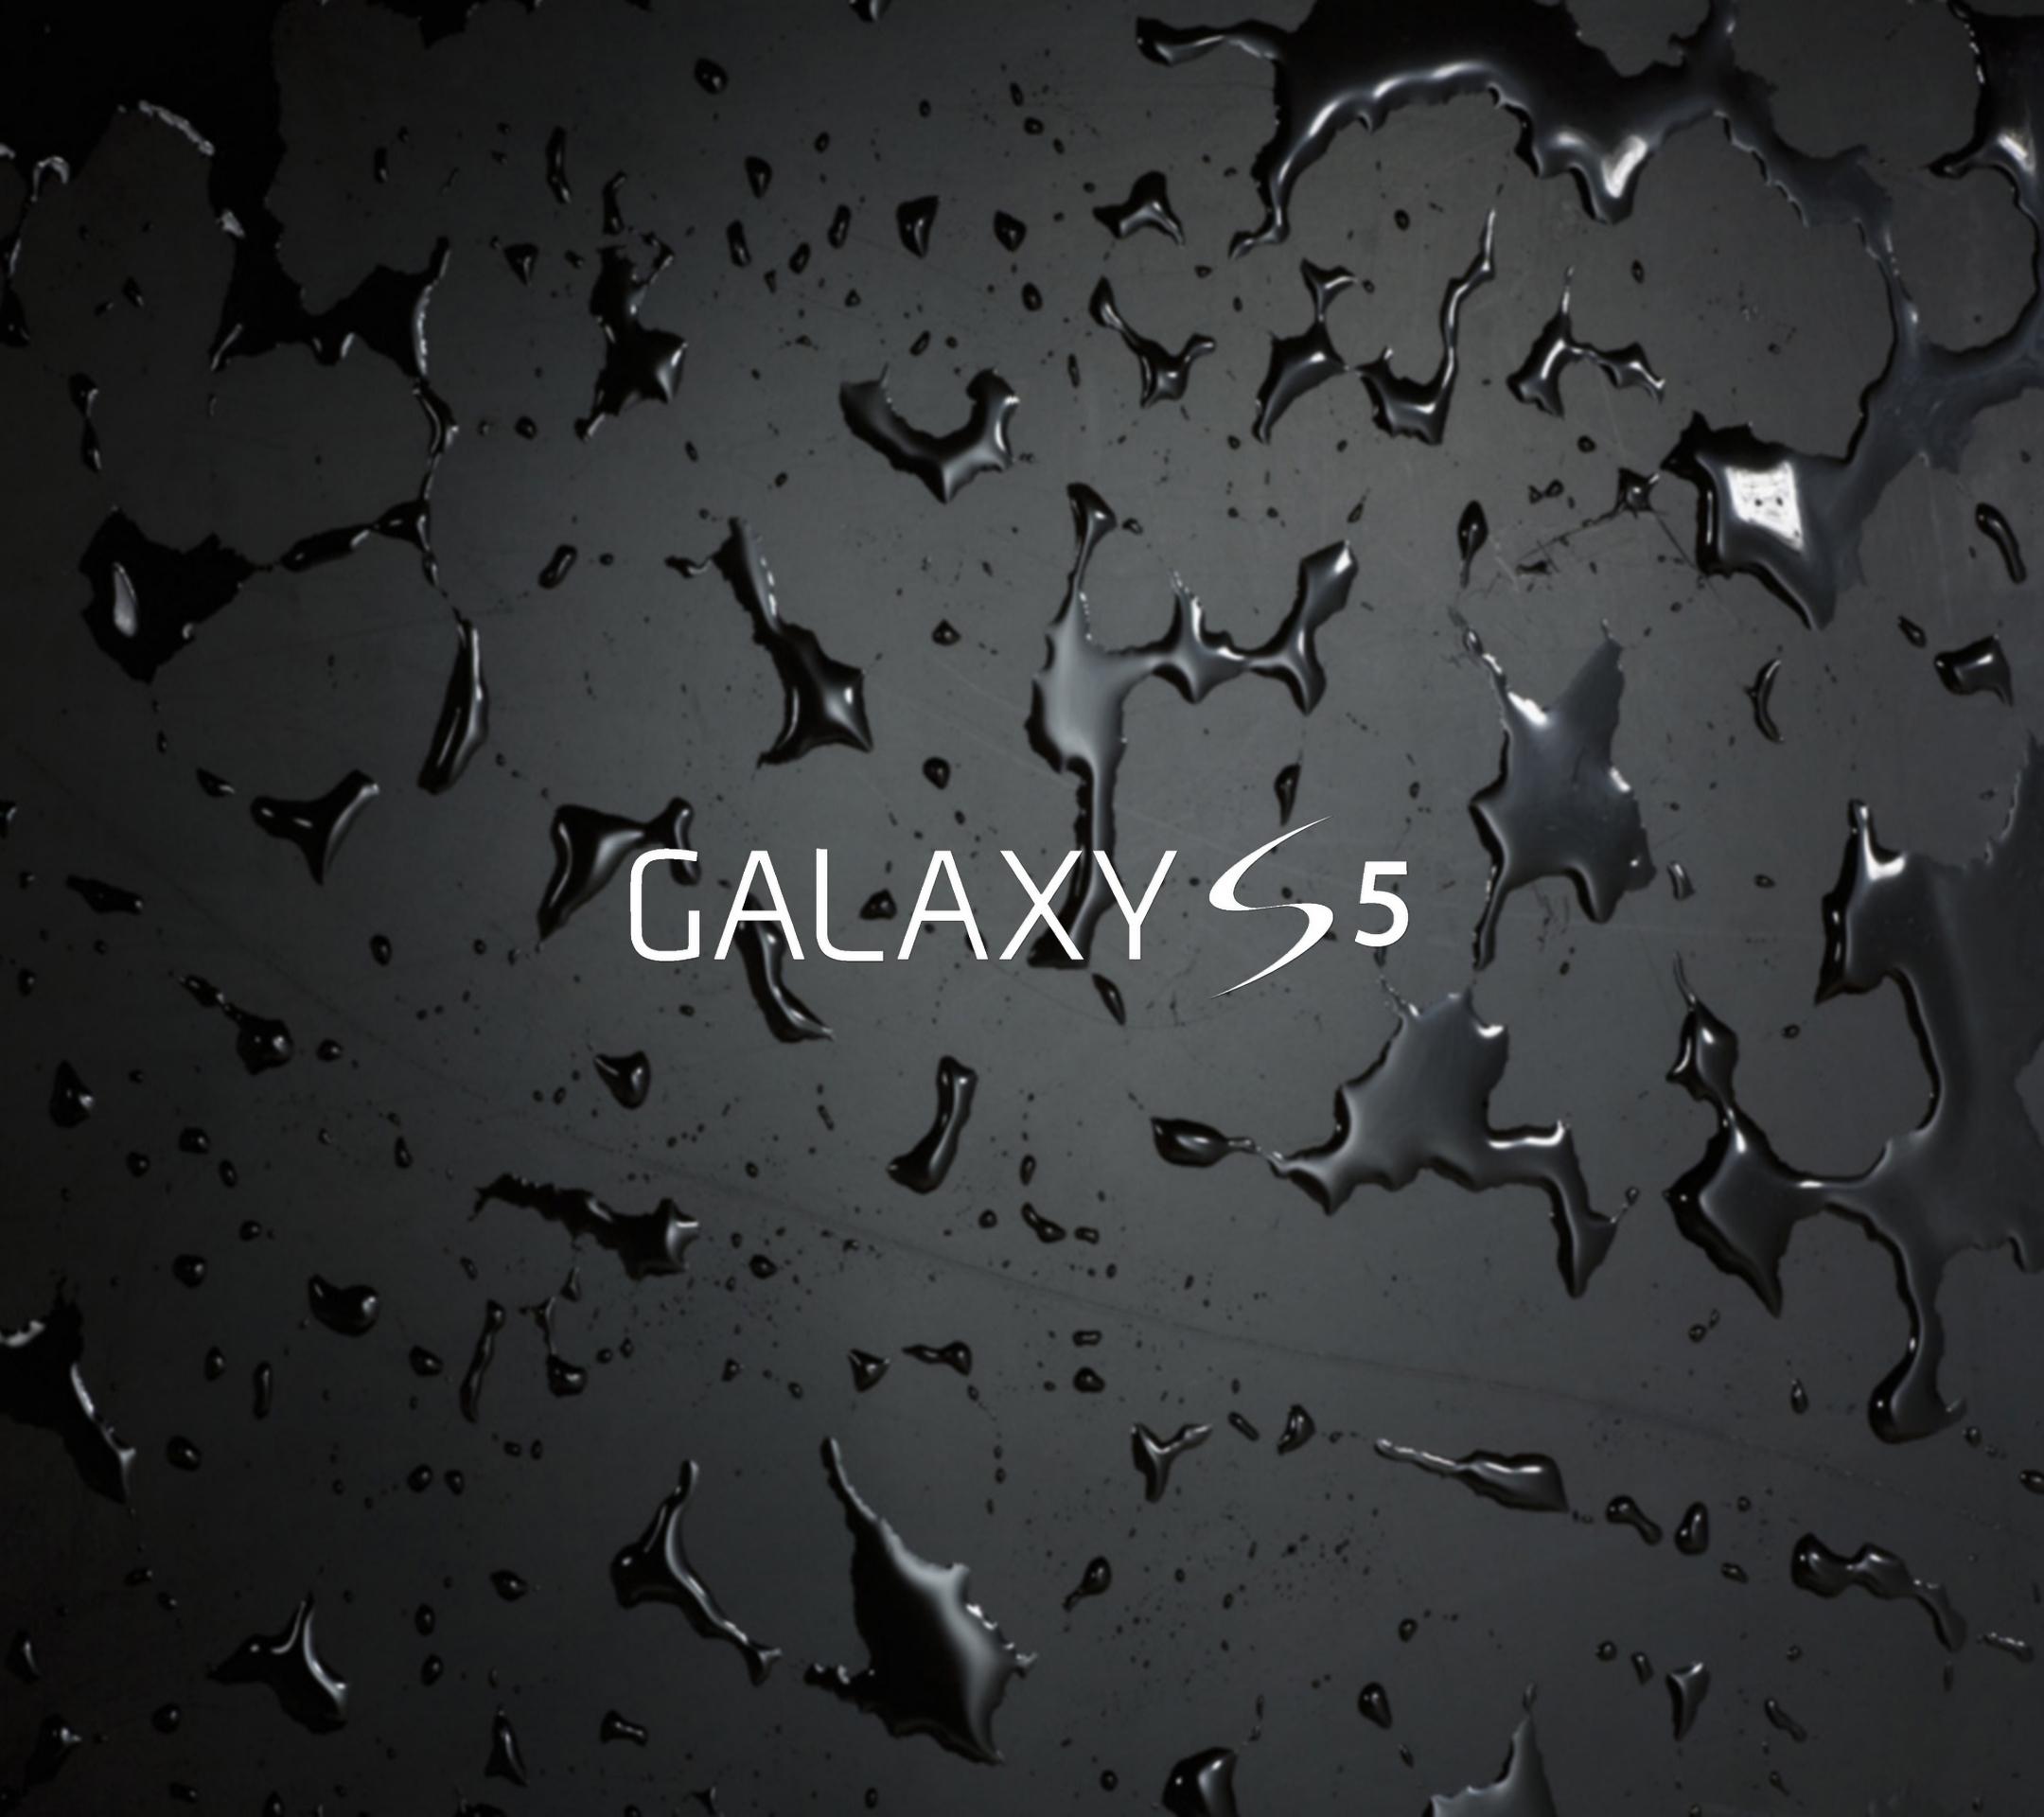 Fond D Ecran Galaxy S5 Galaxy S5 01 2160x1920 Gratuit